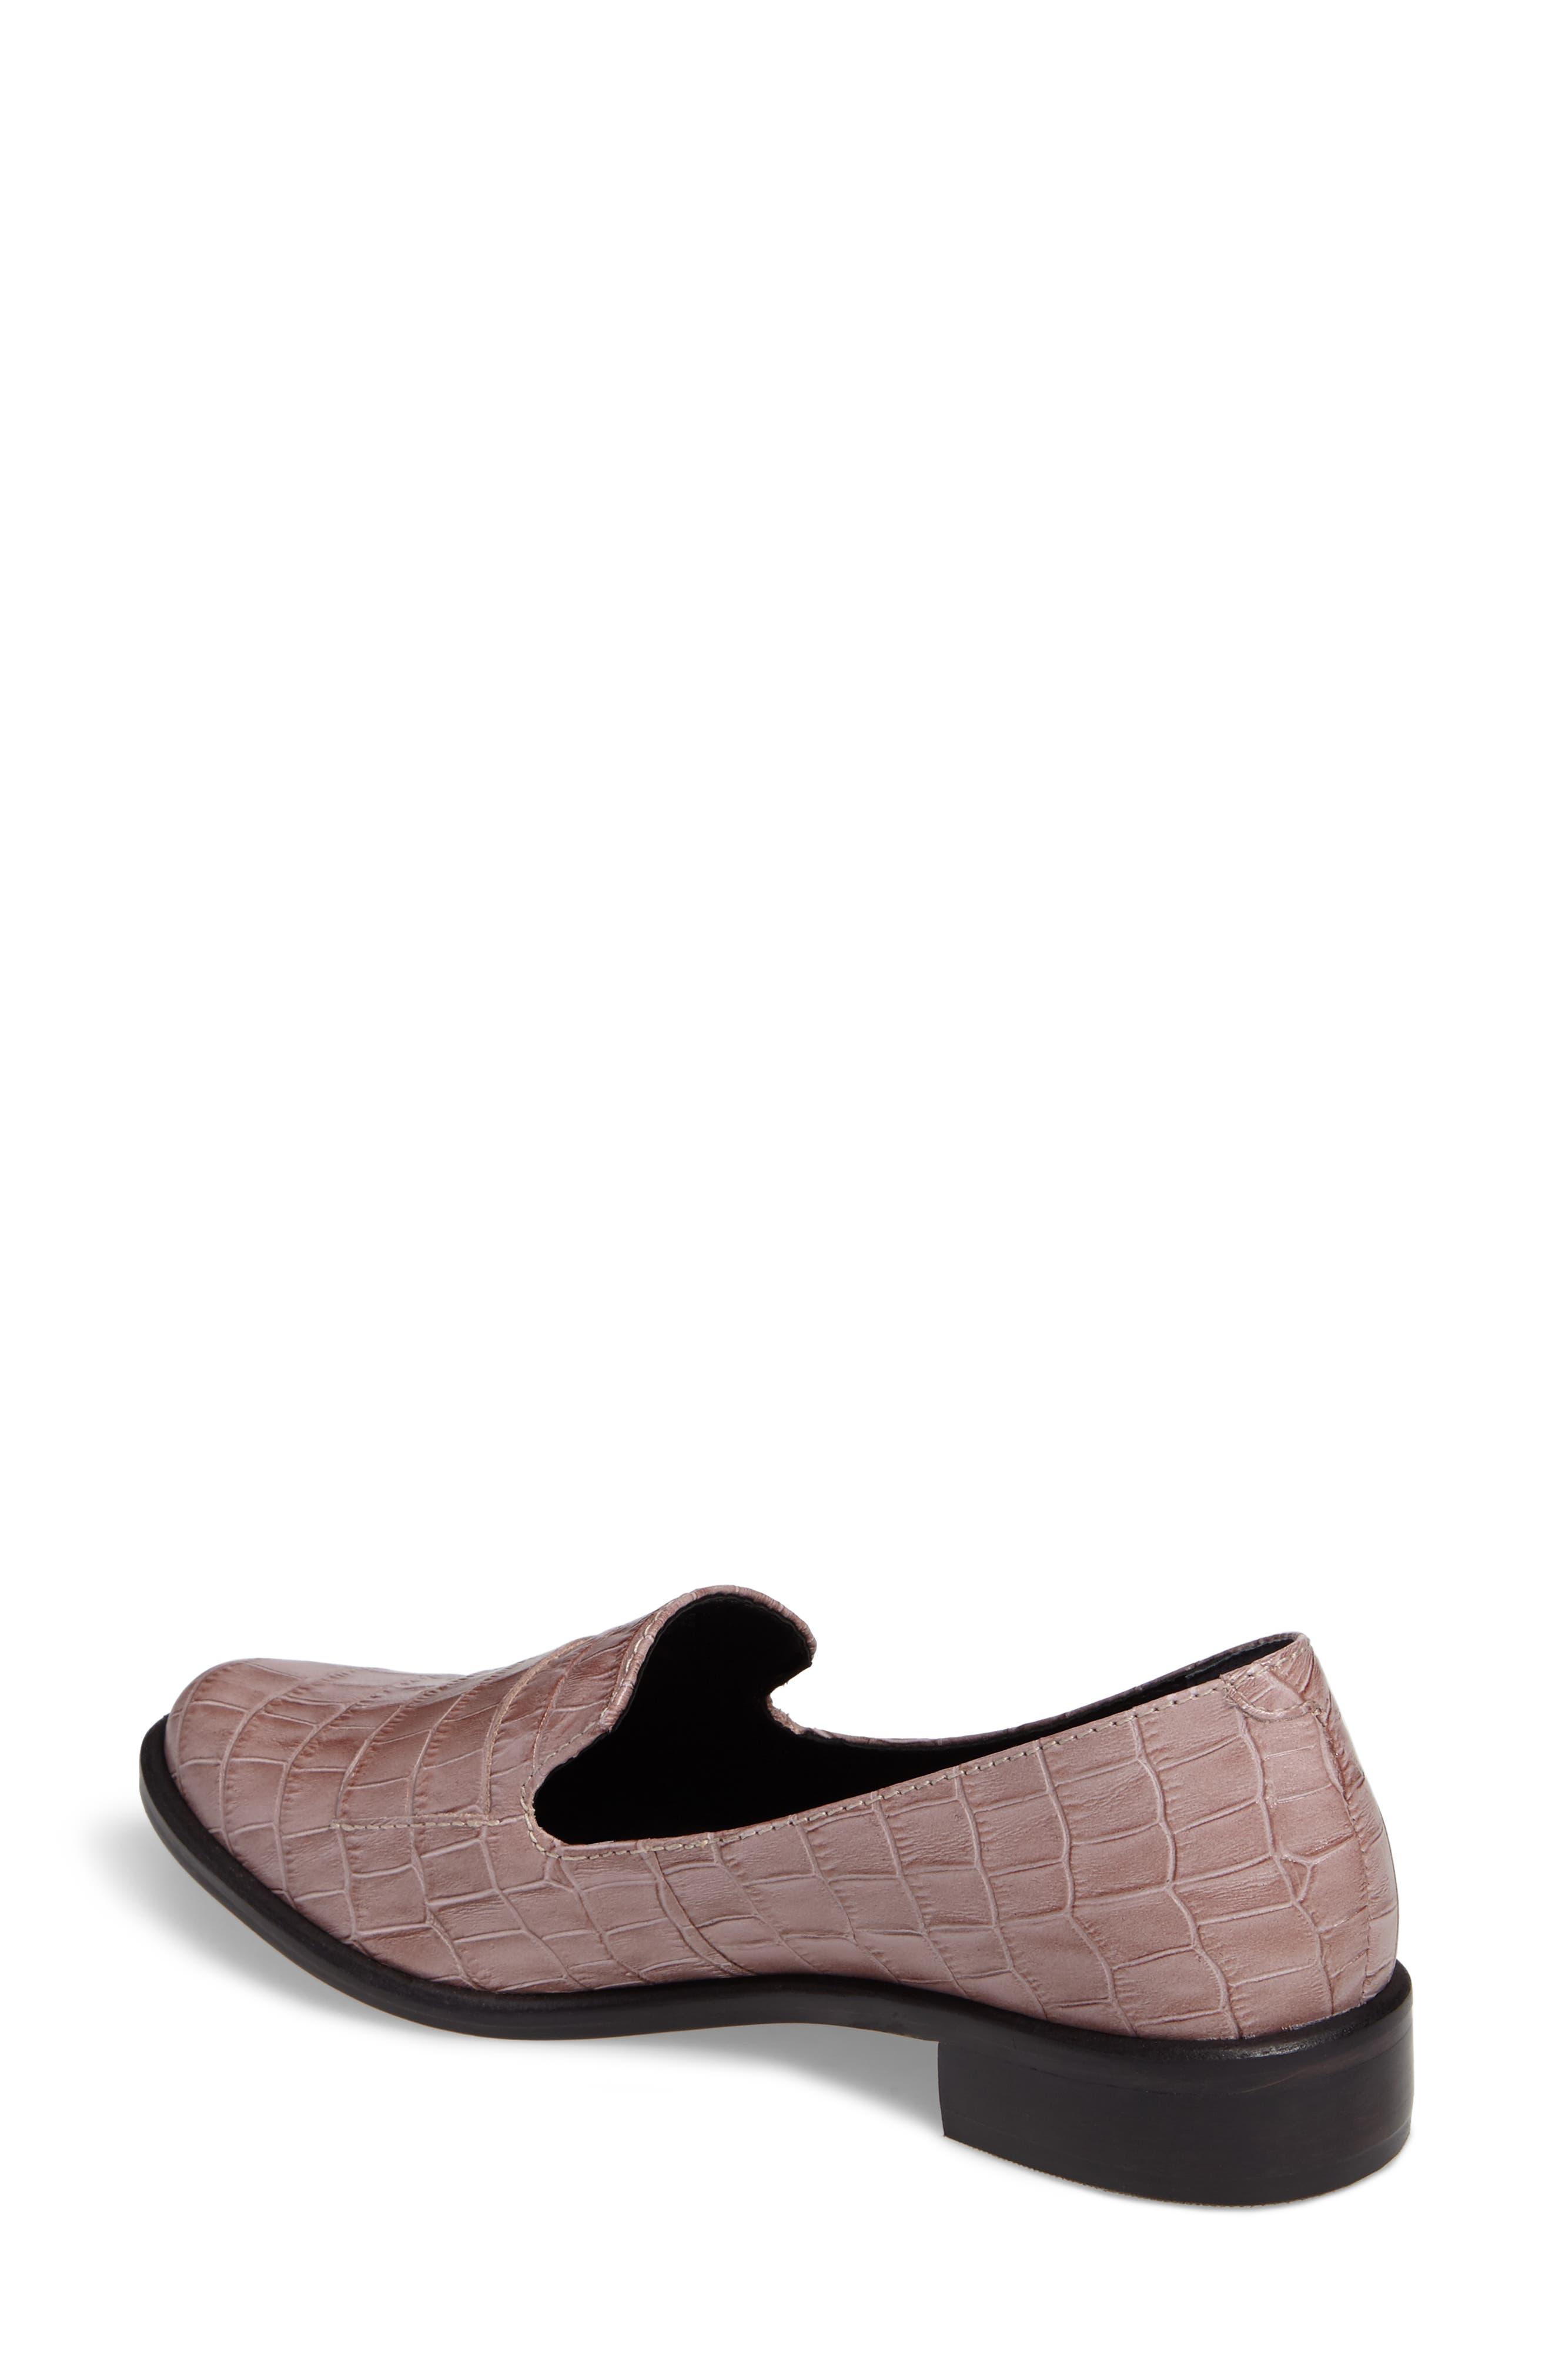 M4D3 'Ocean' Flat Loafer,                             Alternate thumbnail 12, color,